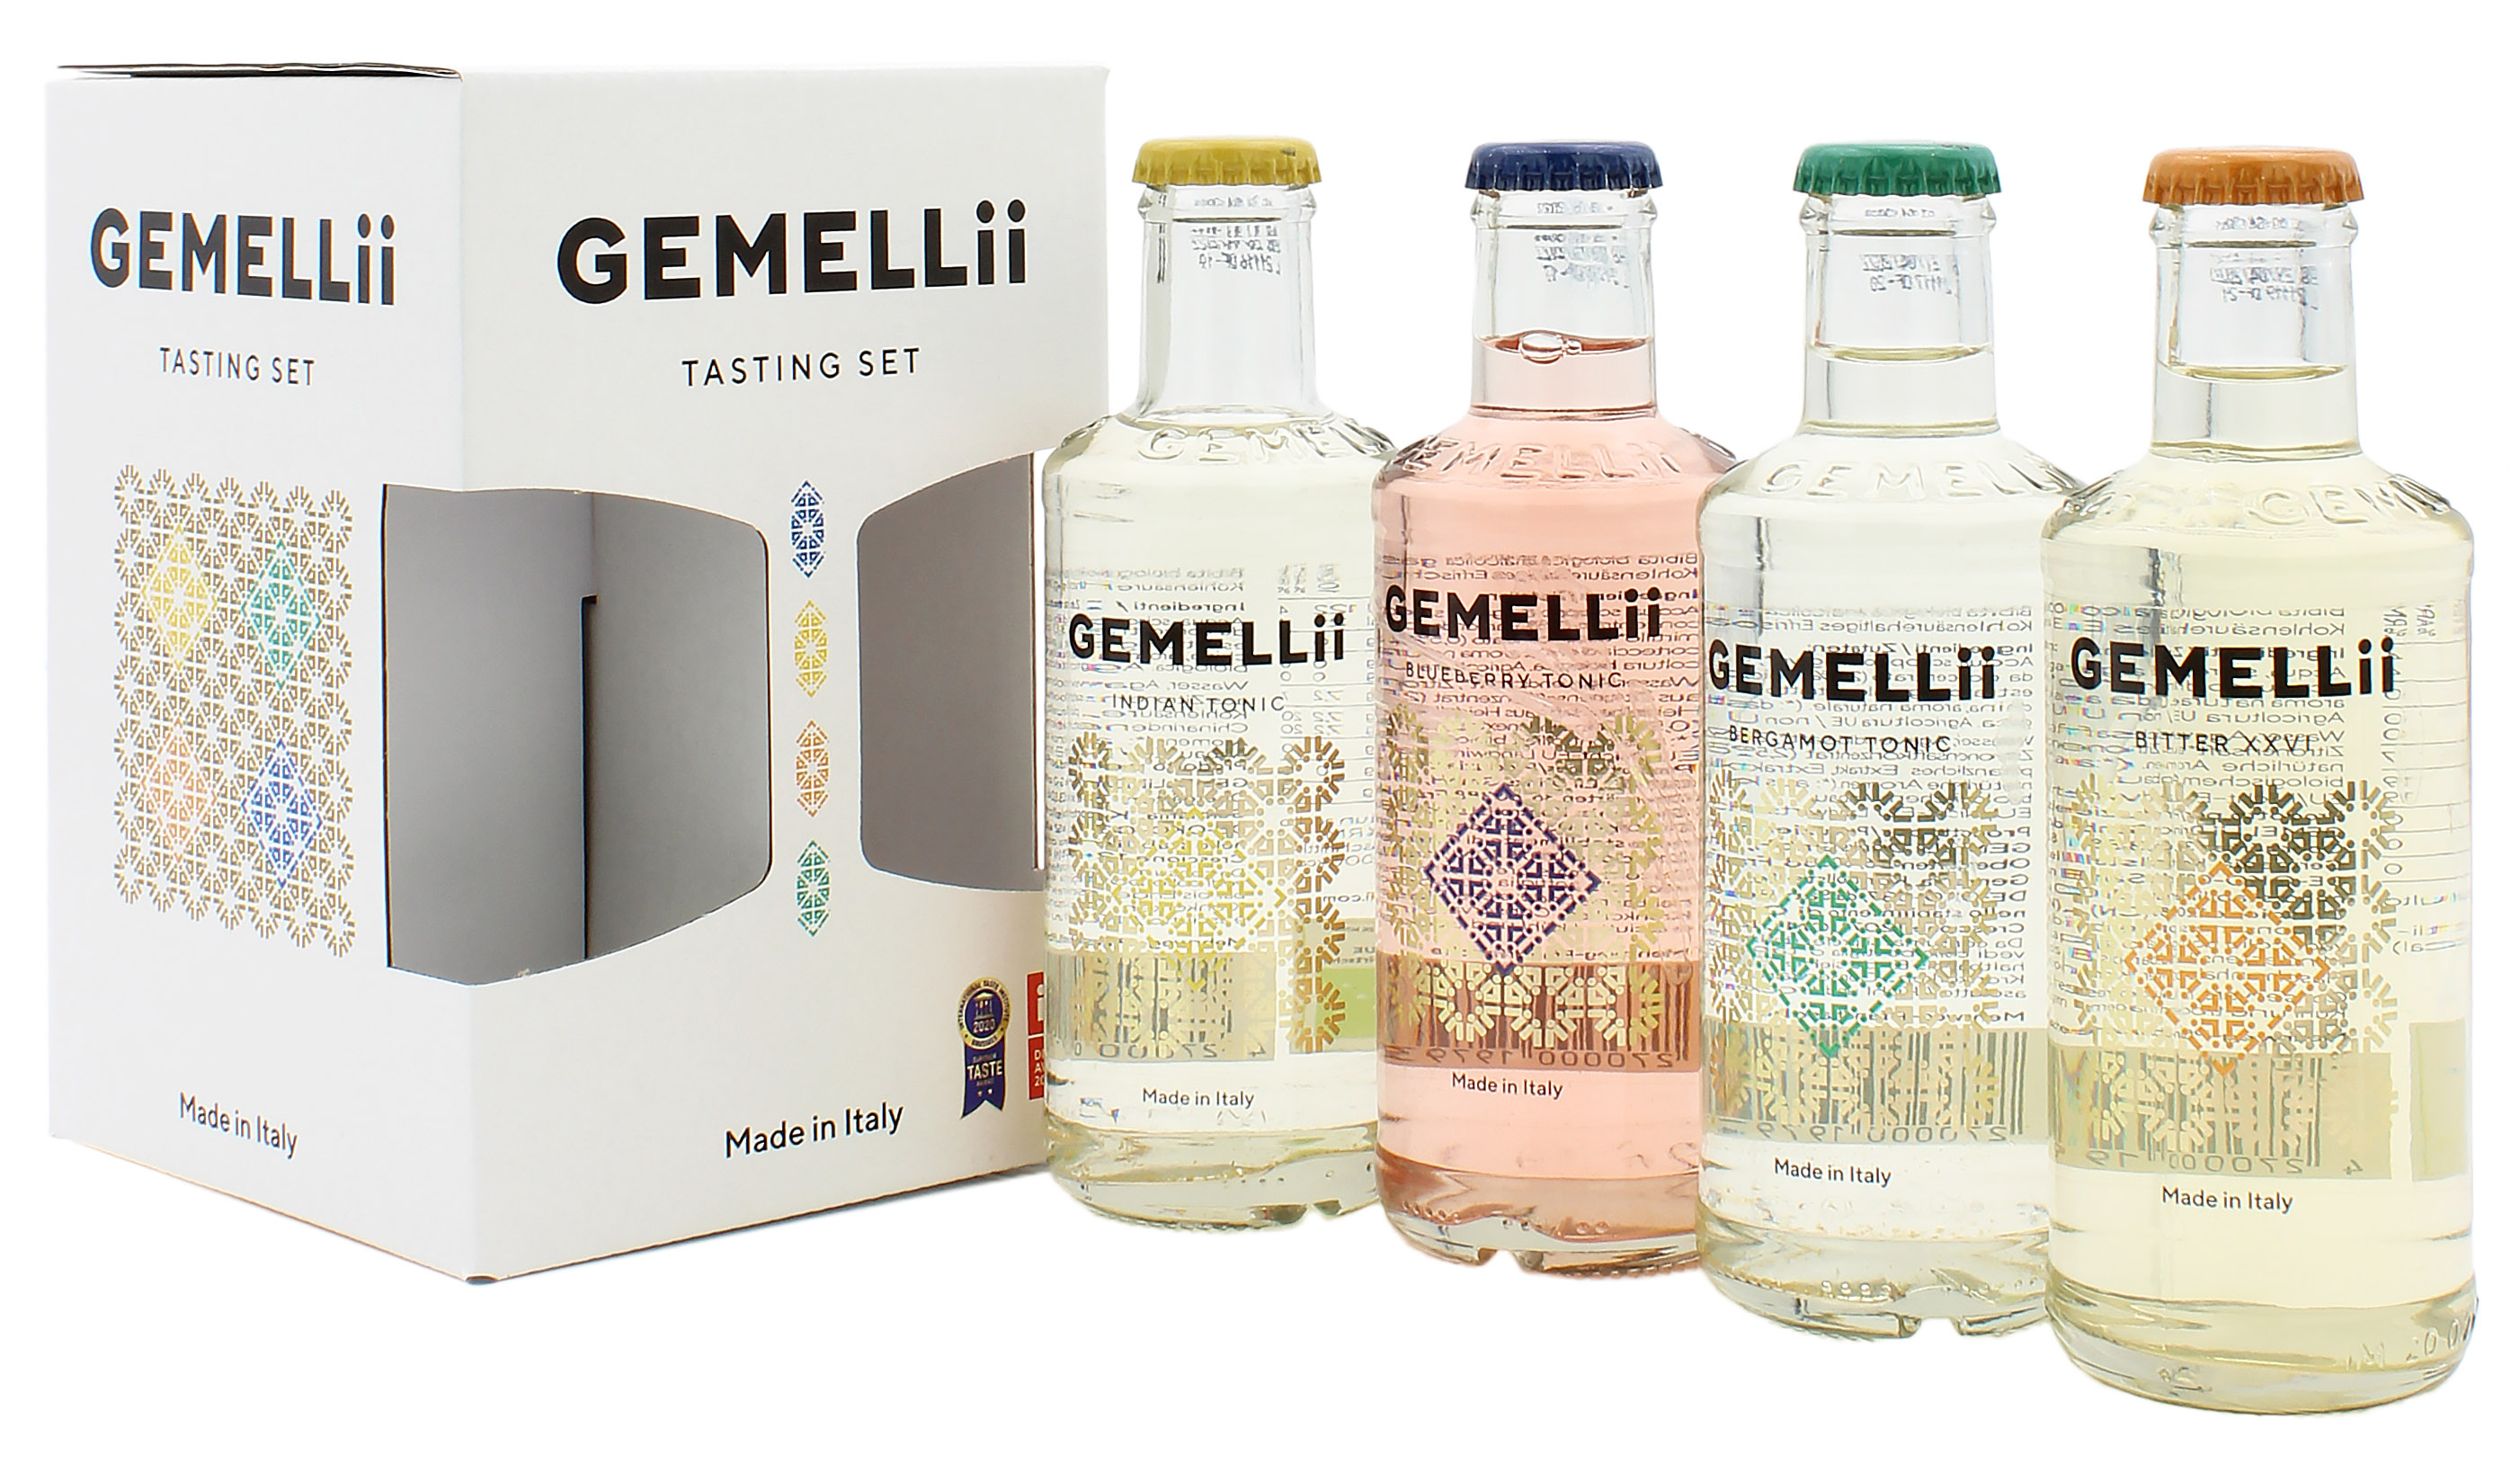 4er Pack GEMELLii Tonic Probierset alle Sorten 4x0,2l (mit Fenster)